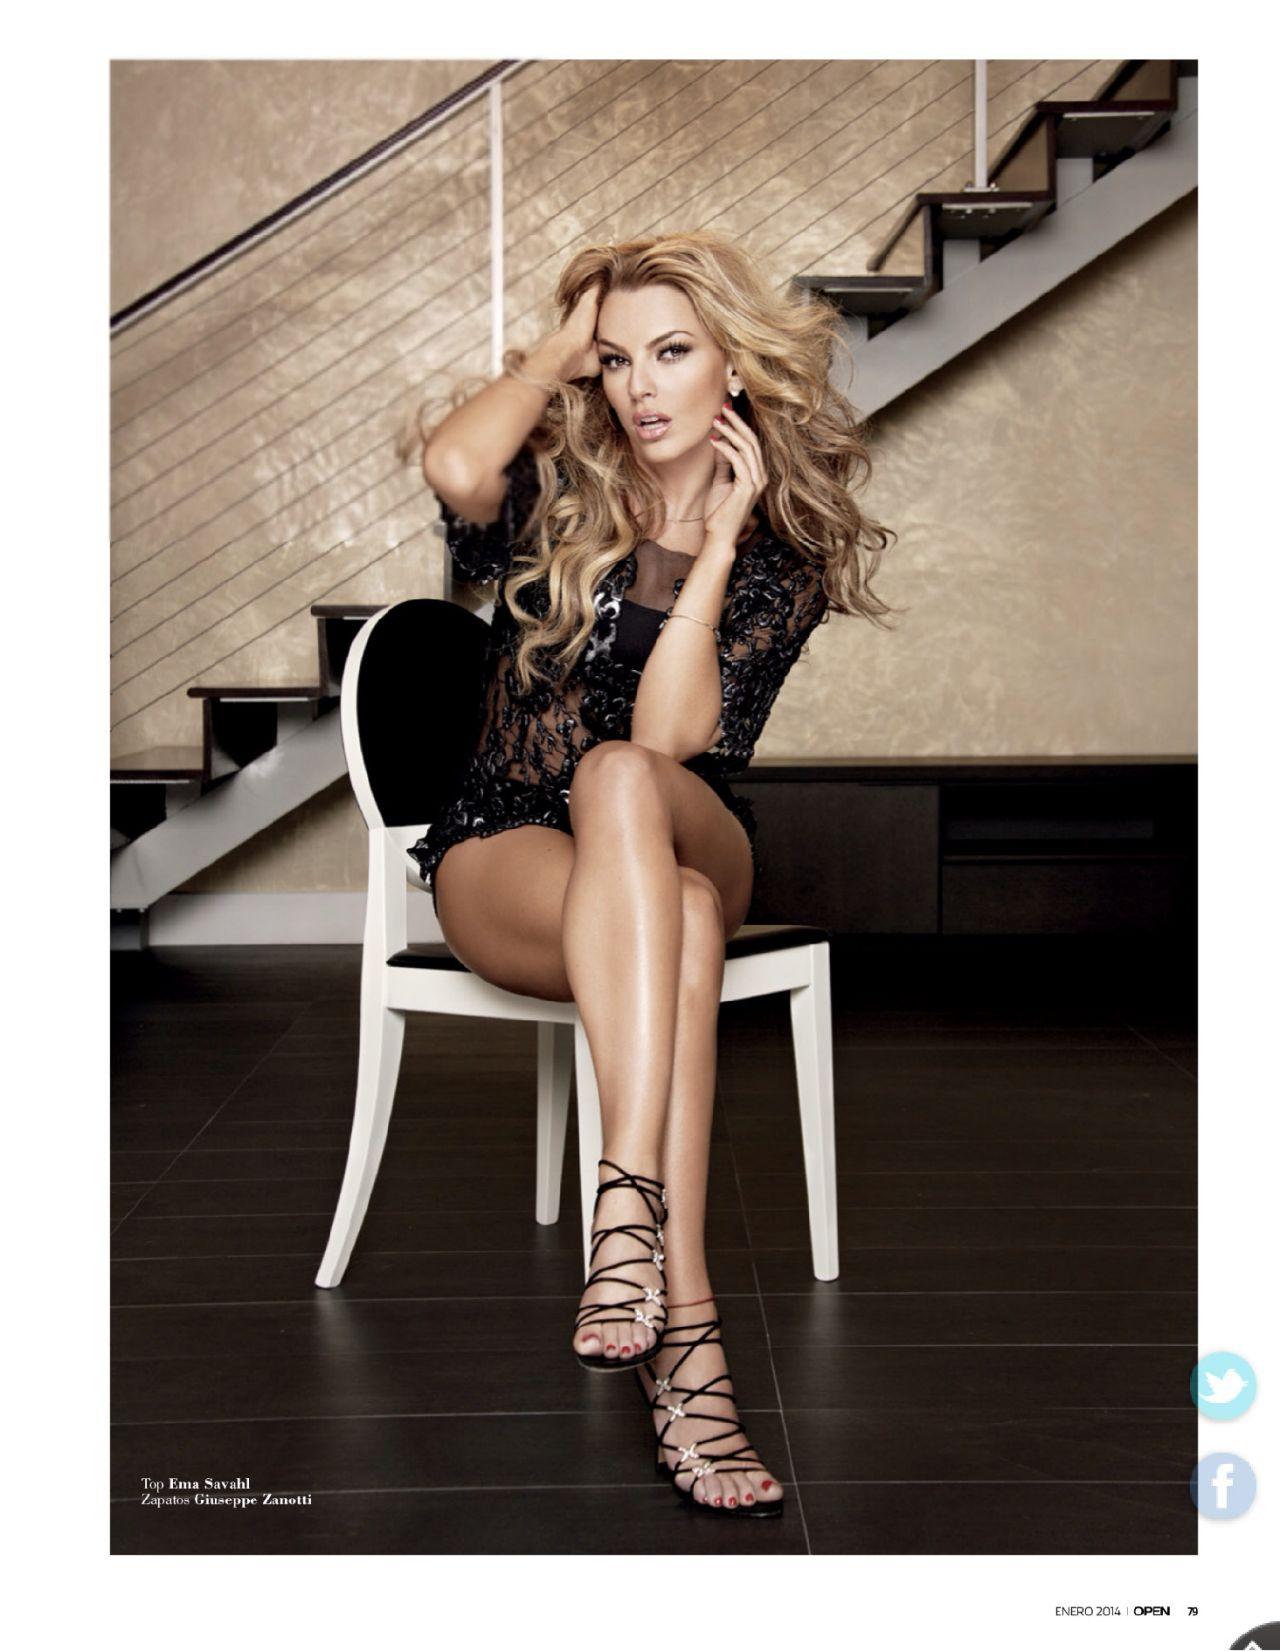 Celebrity Marjorie De Sousa nude (68 photo), Pussy, Cleavage, Feet, legs 2017